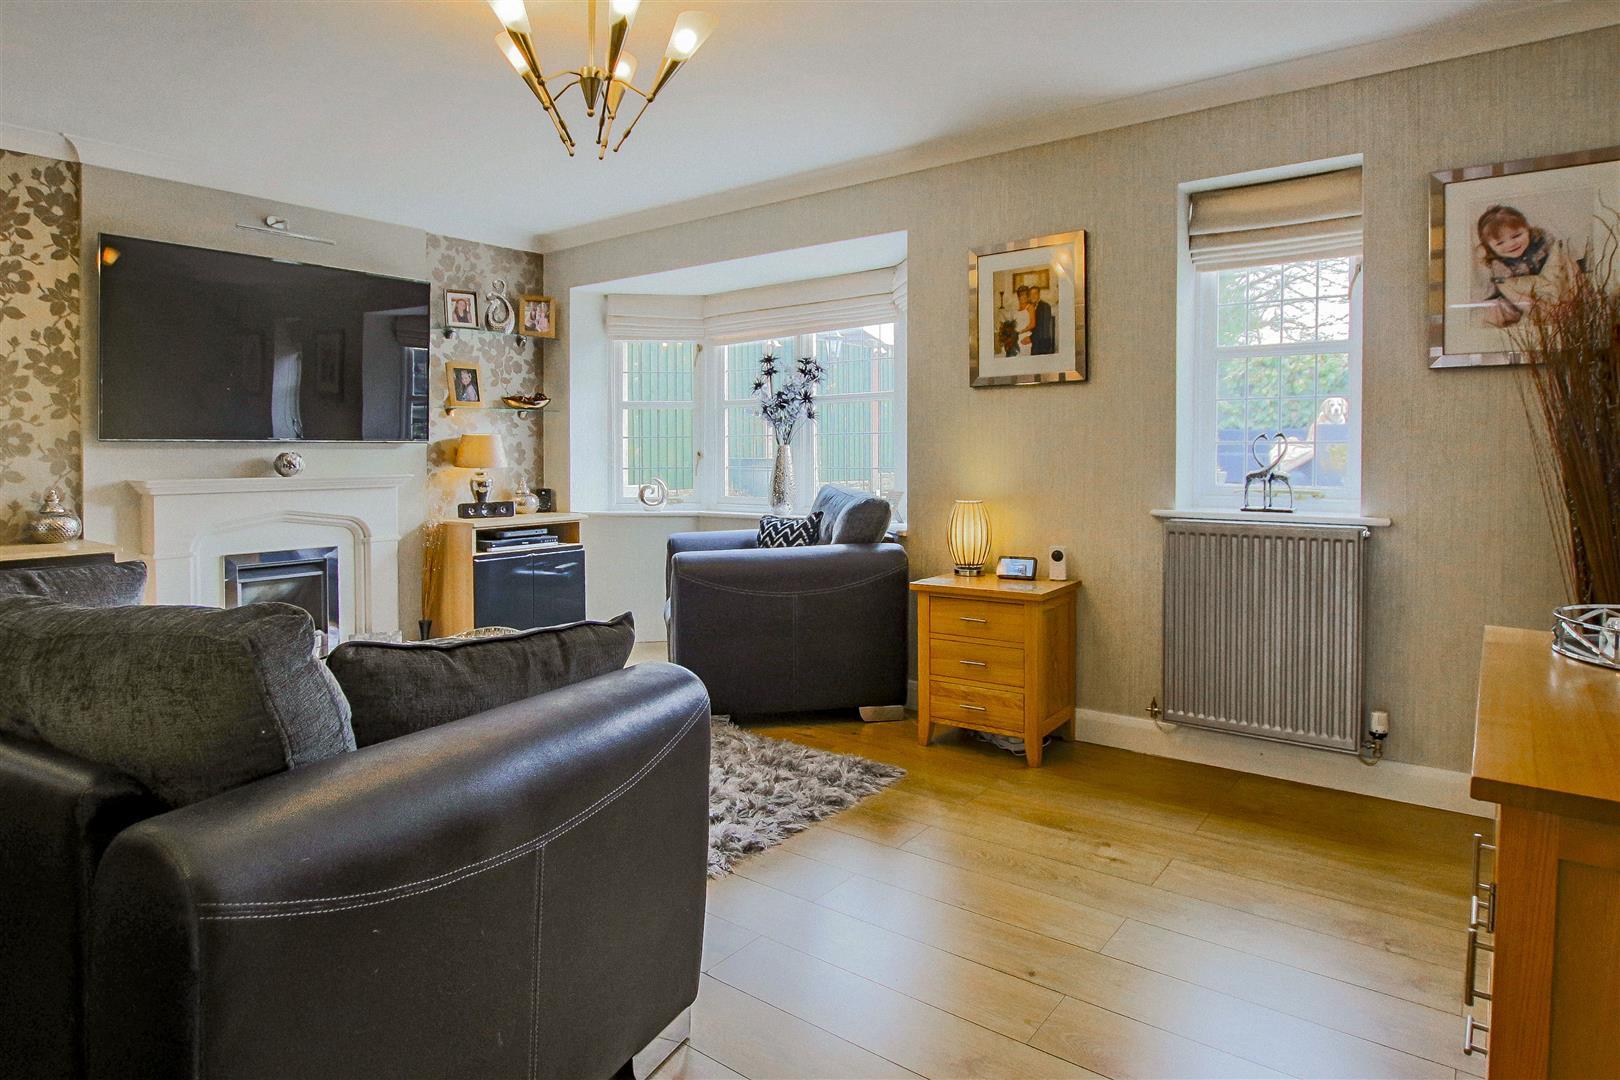 4 Bedroom Detached House For Sale - redwing31754.JPG